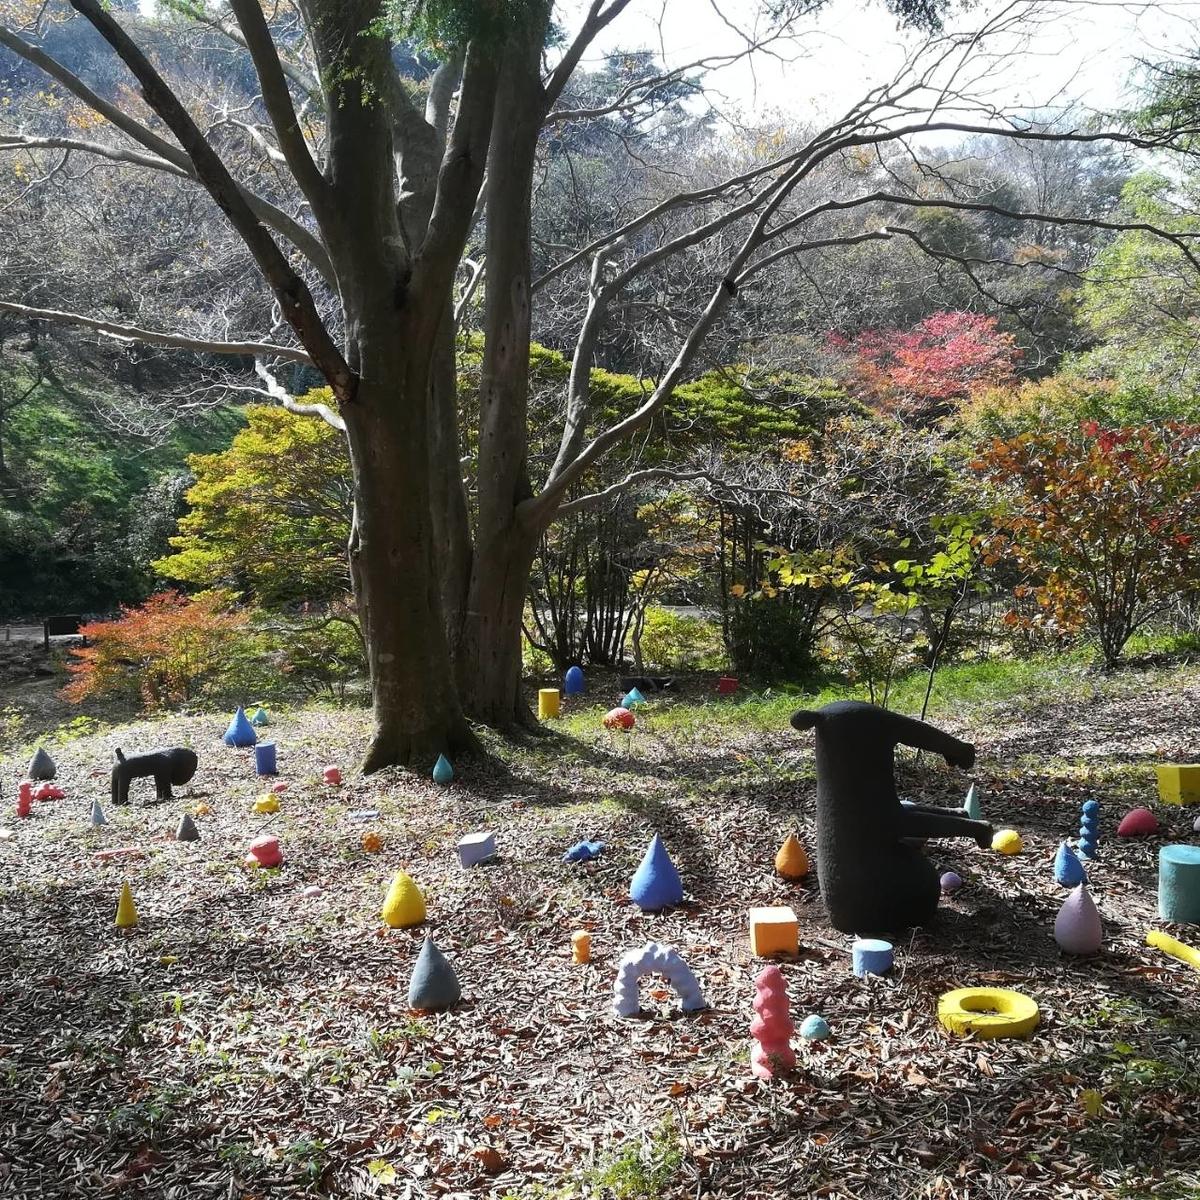 六甲高山植物園 アート作品